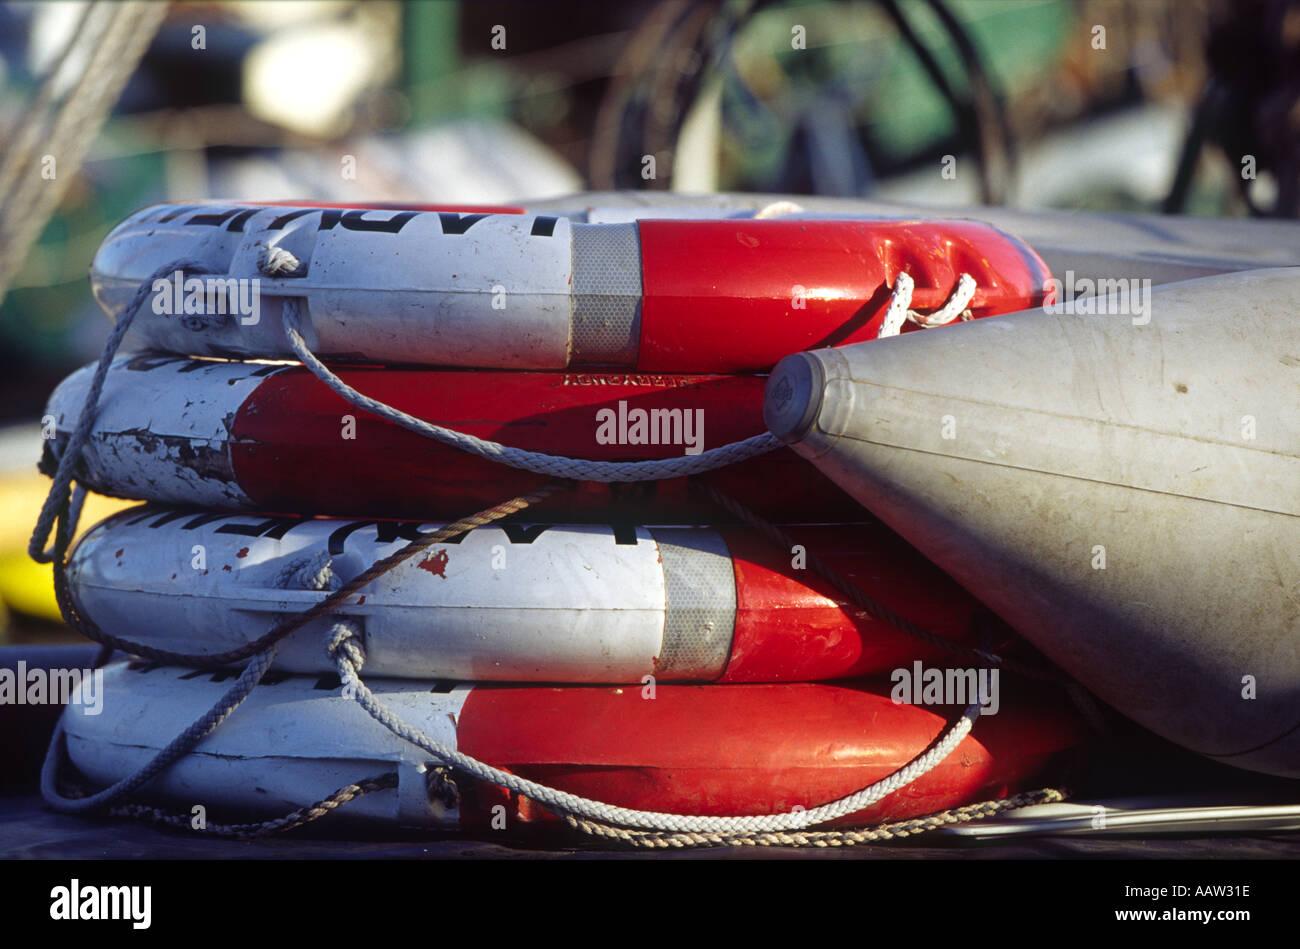 lifebouys stacked at Hythe Quay Maldon Essex England Stock Photo